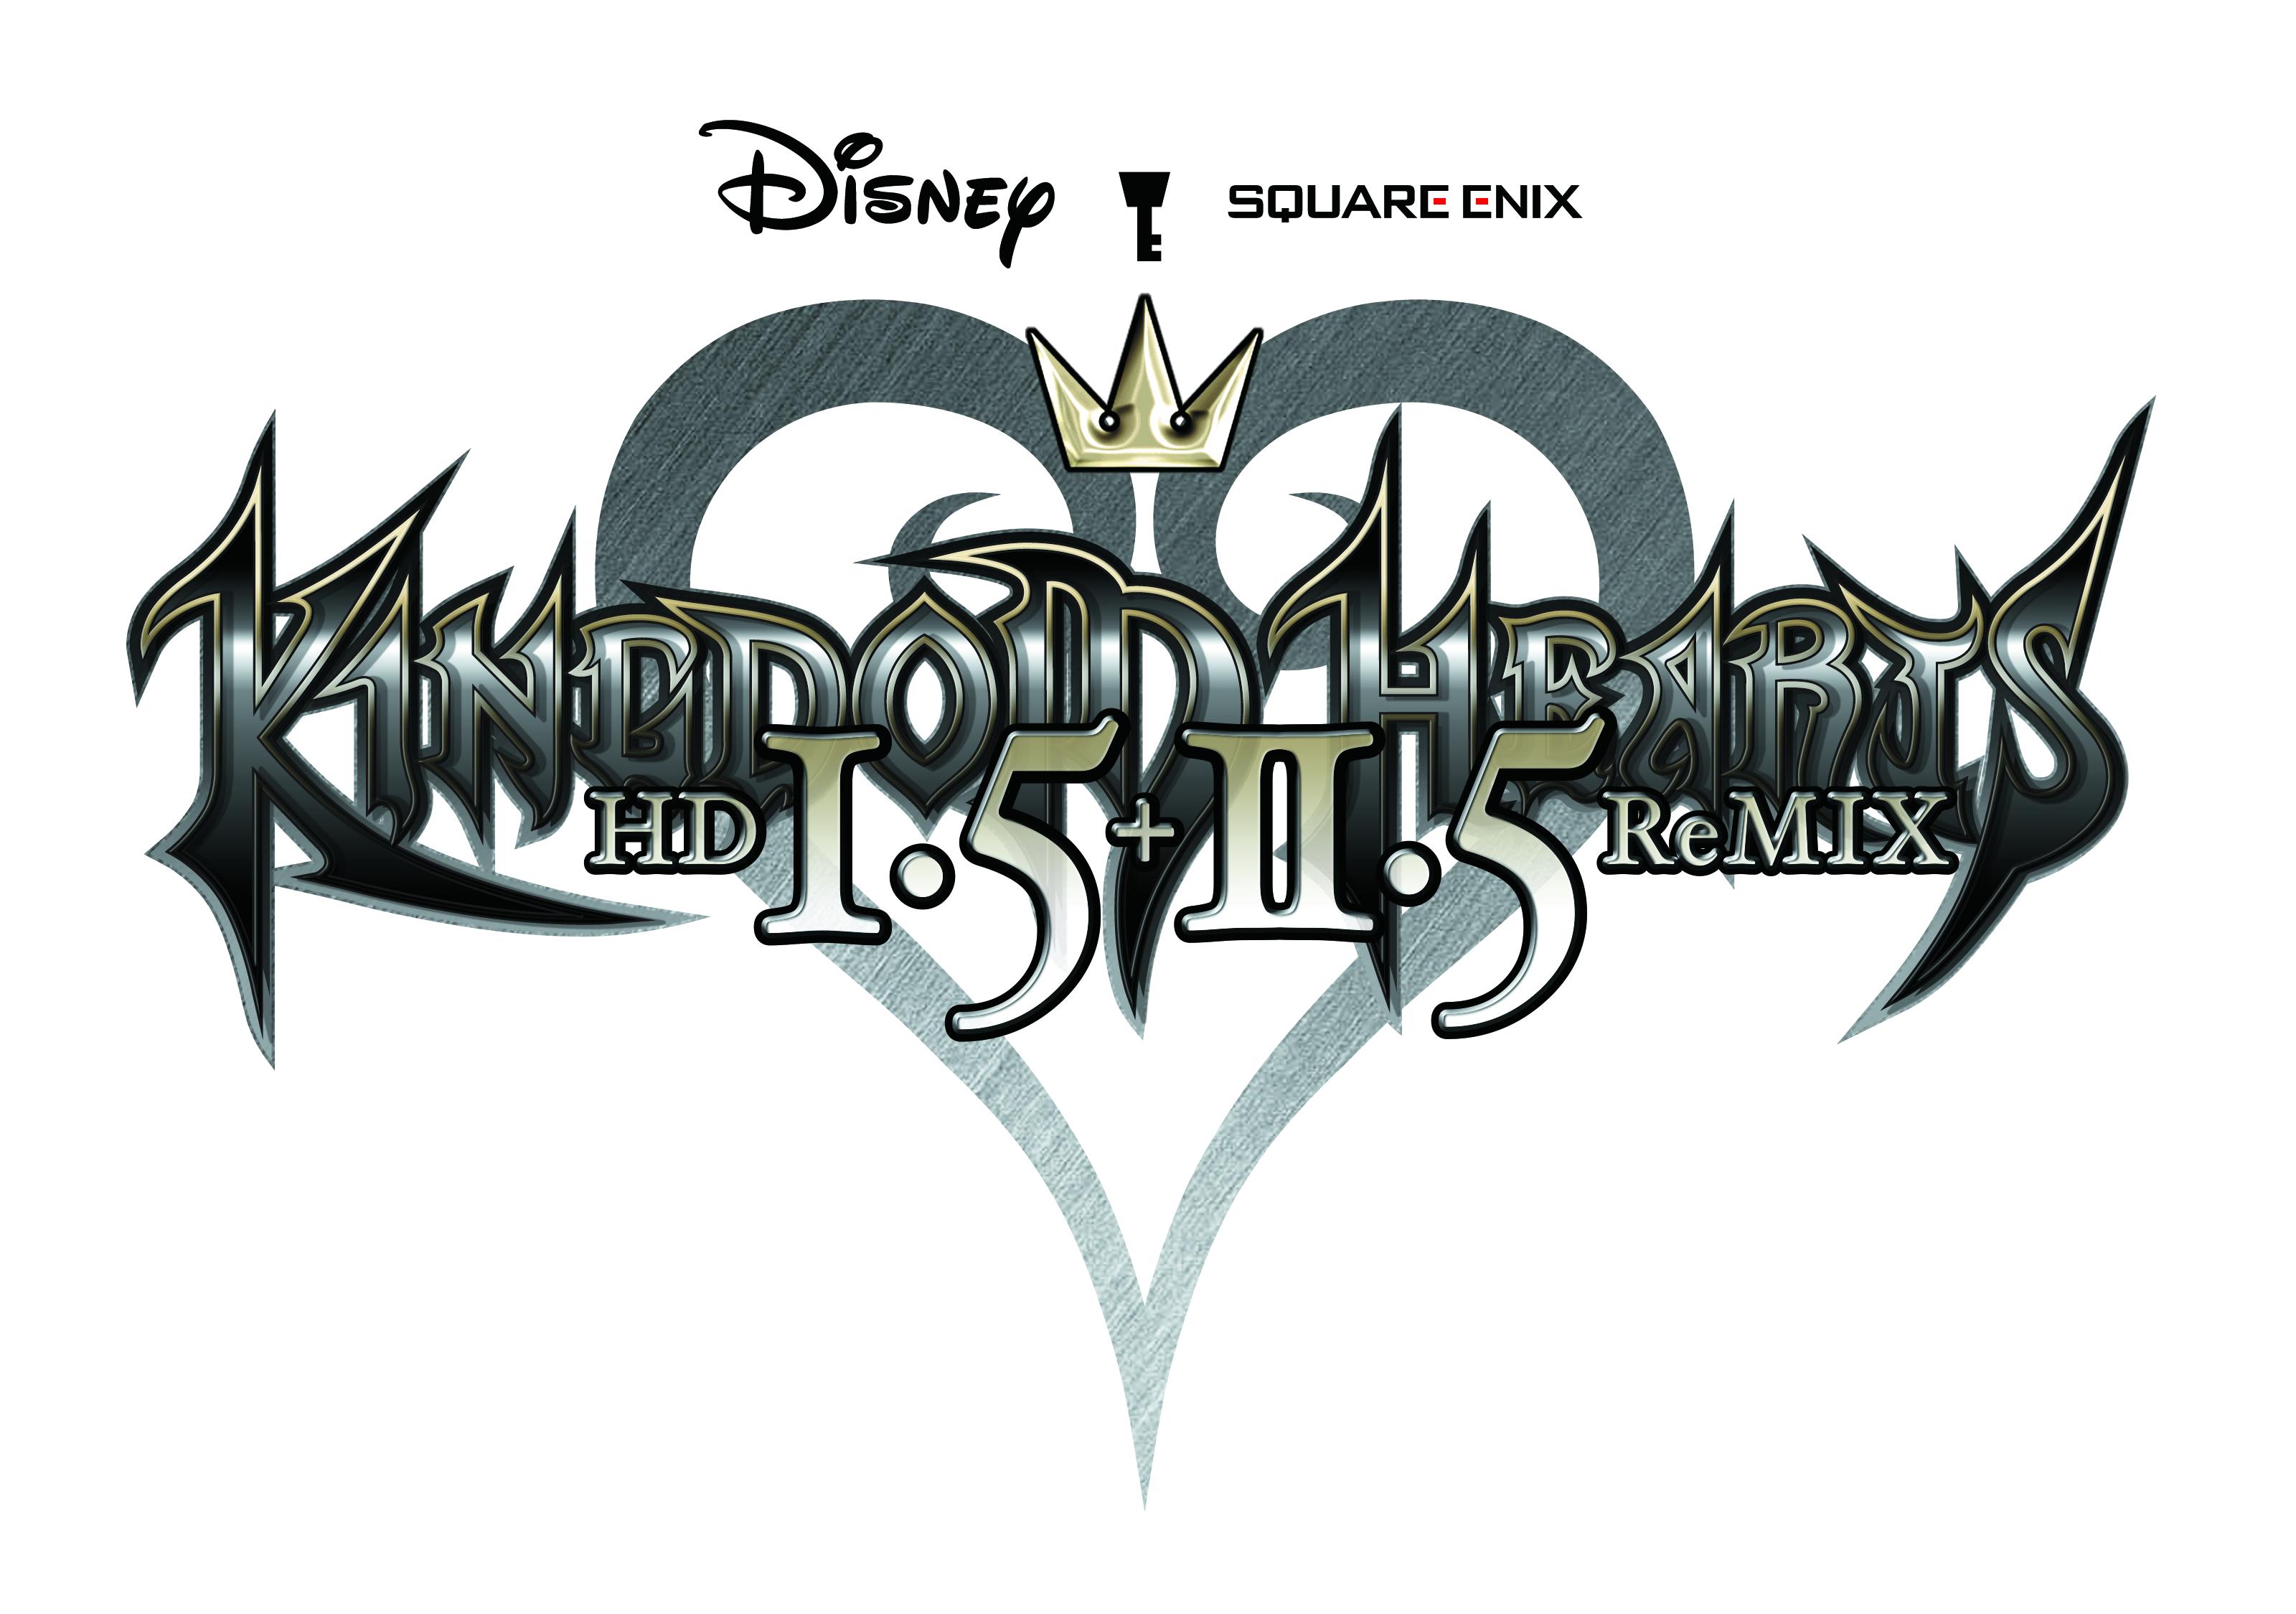 kingdom-hearts-hd-1-5-2-5-remix-esta-presentando-problemas-frikigamers.com